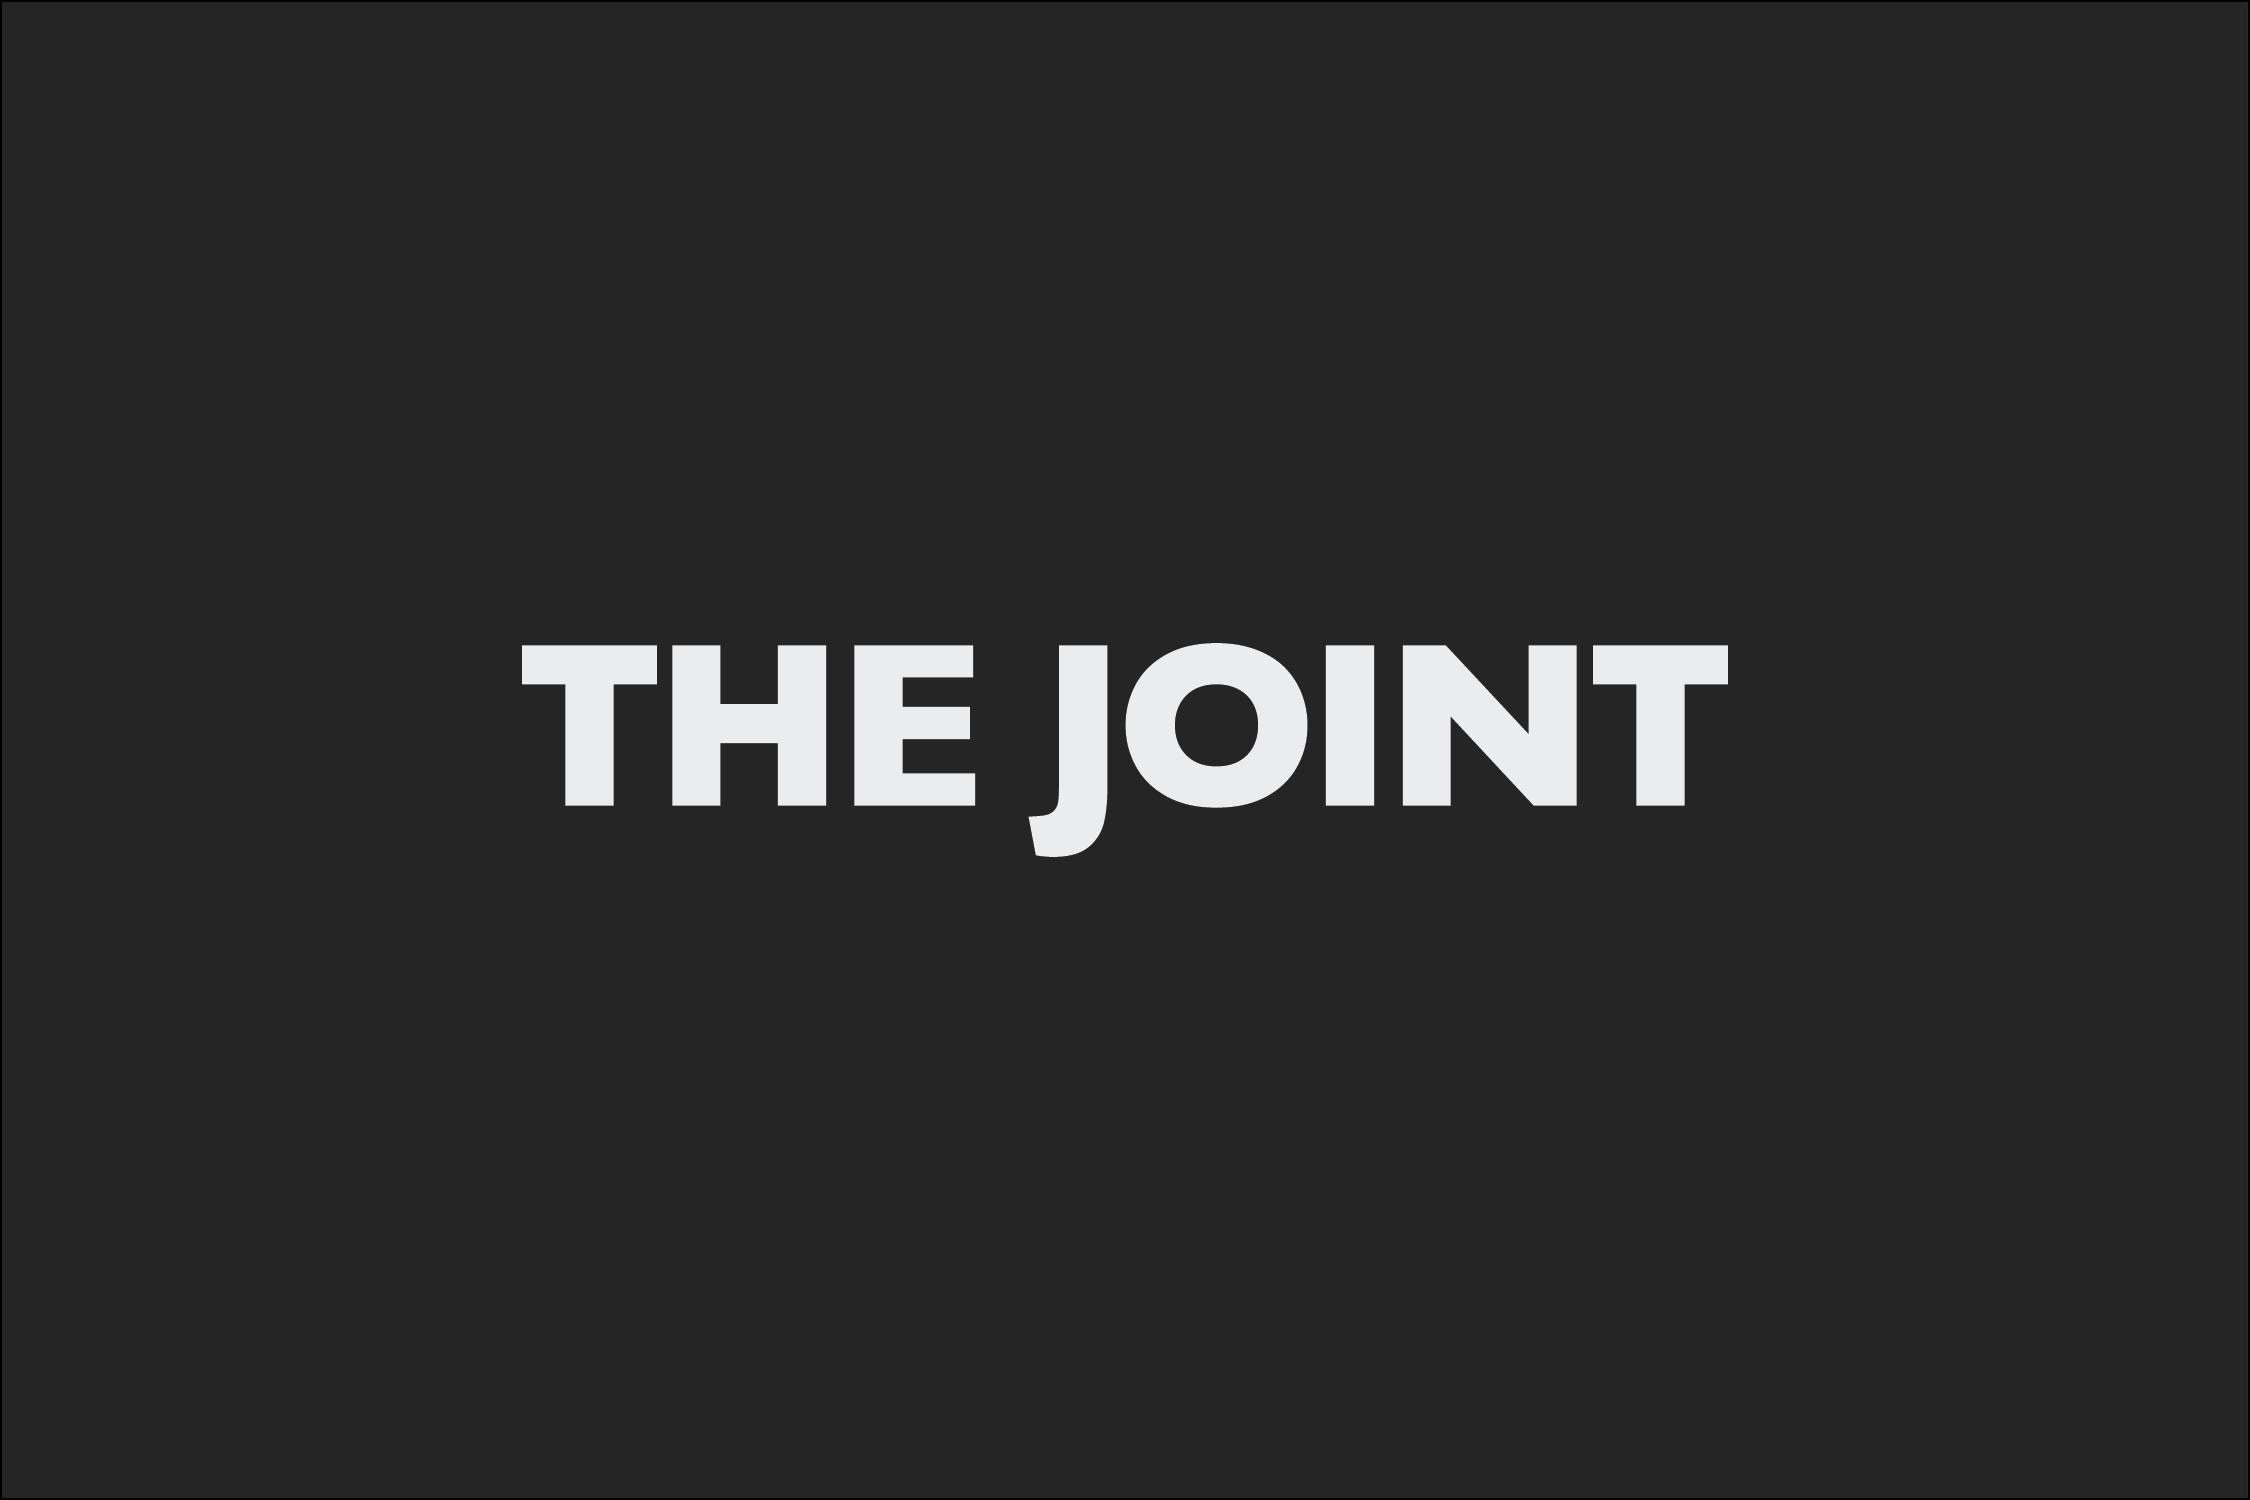 The Joint Branding